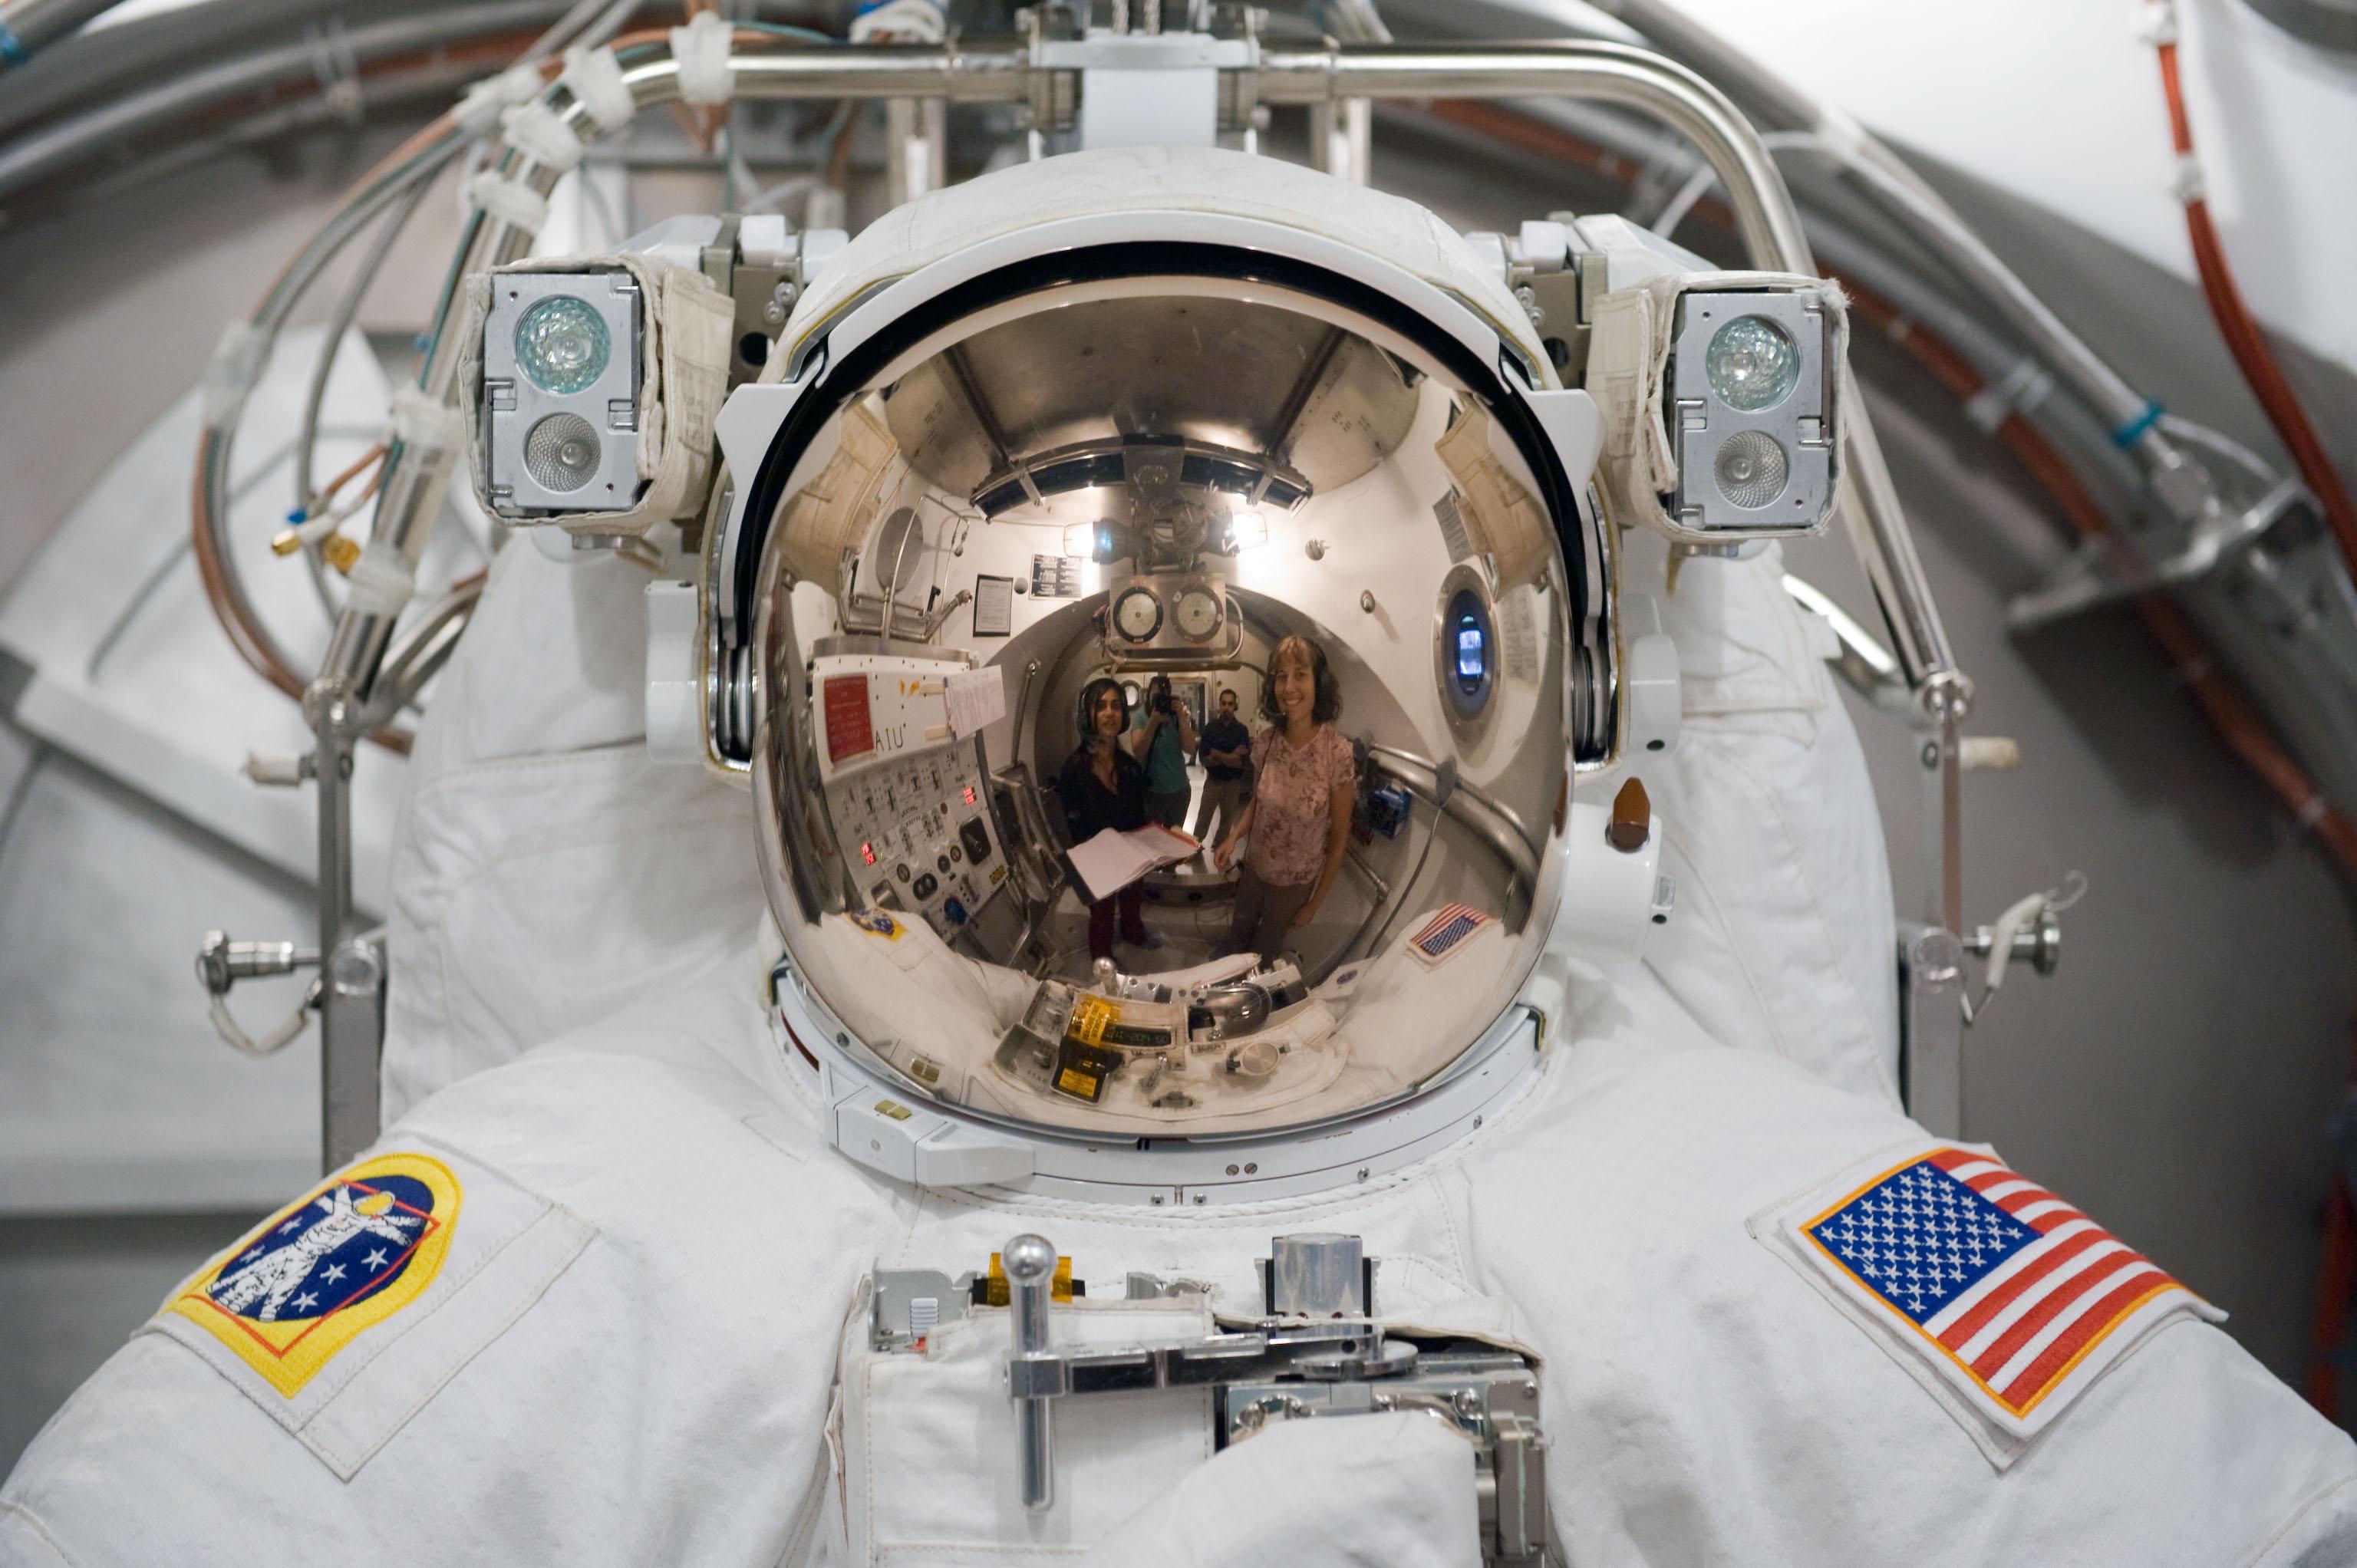 NASA Emu Helmet 2010 - Pics about space